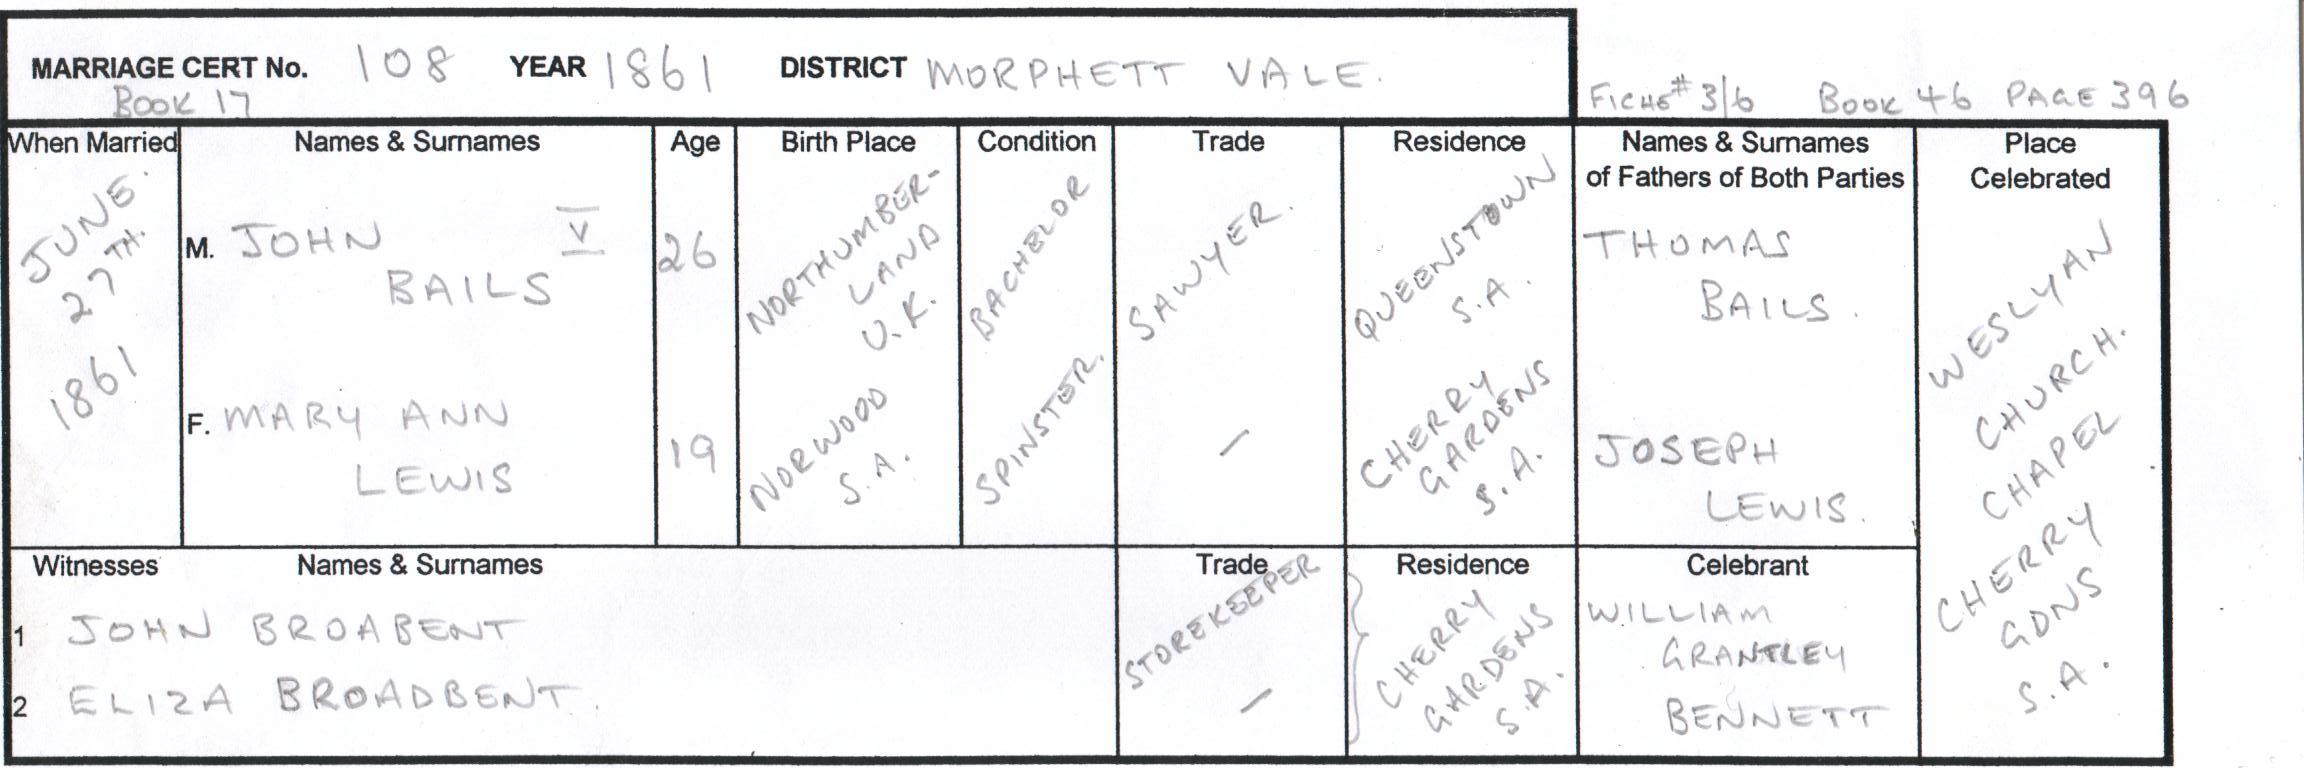 Marriage Certificate John Bails/MaryAnn Lewis